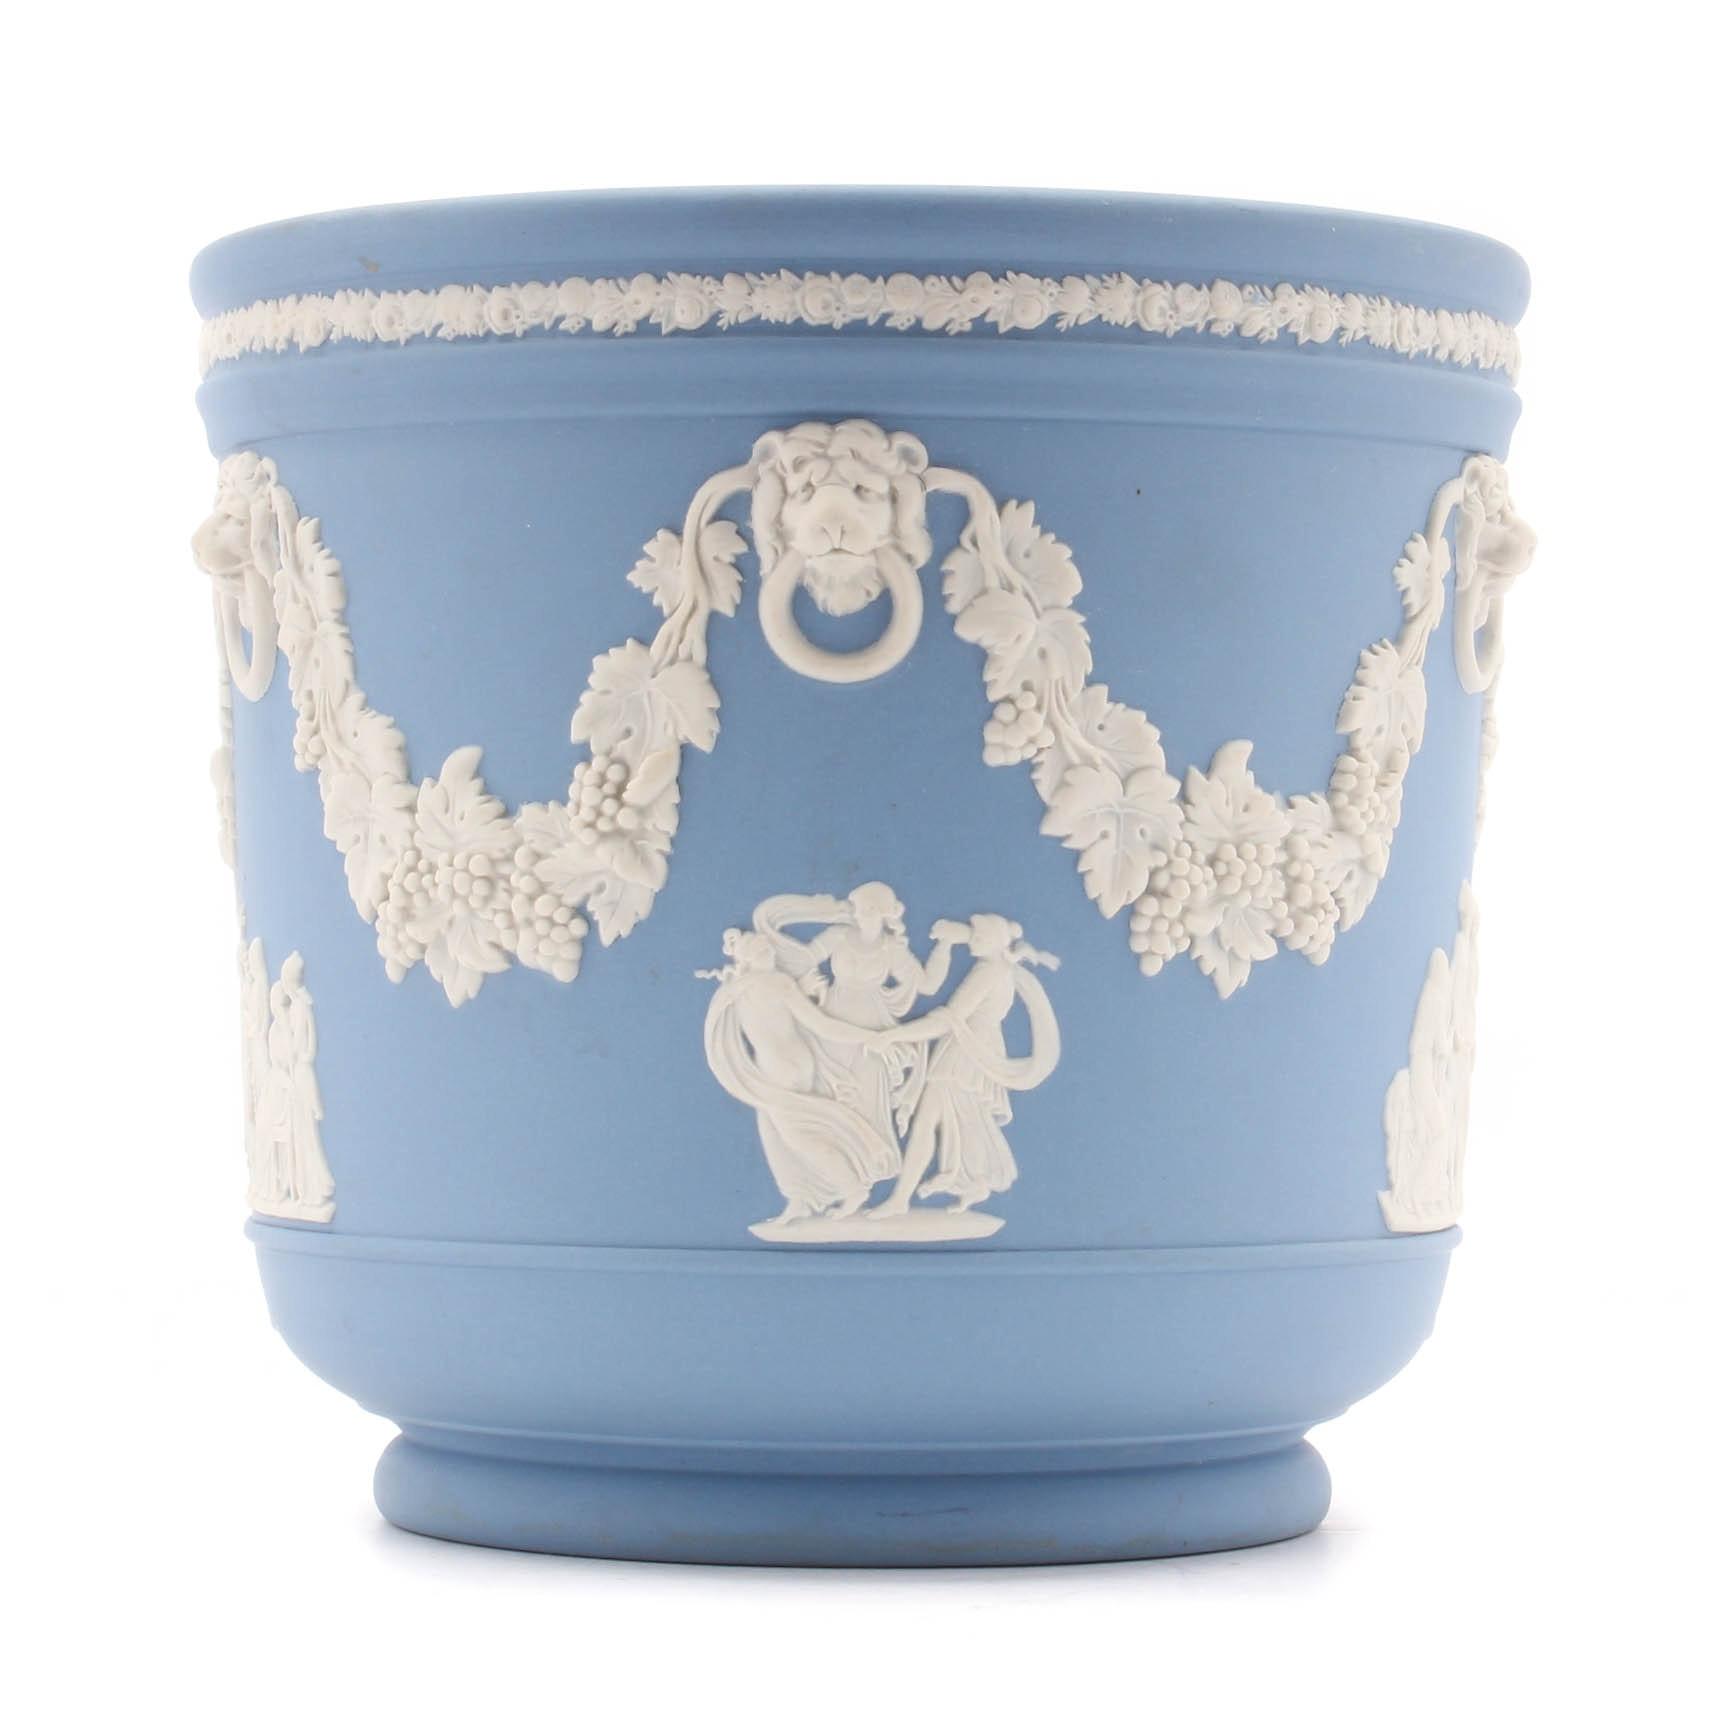 Wedgwood Blue Jasperware Cache Pot